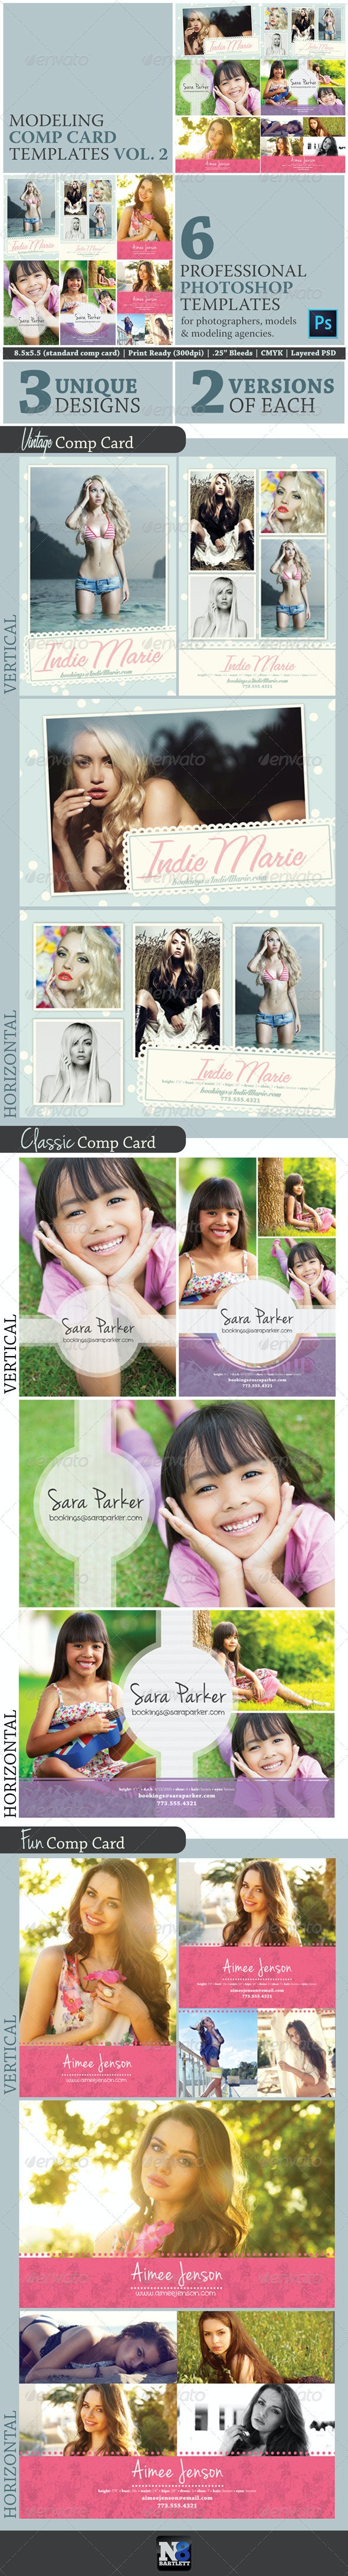 Model Comp Card Template Kit Vol. 2 - Miscellaneous Print Templates